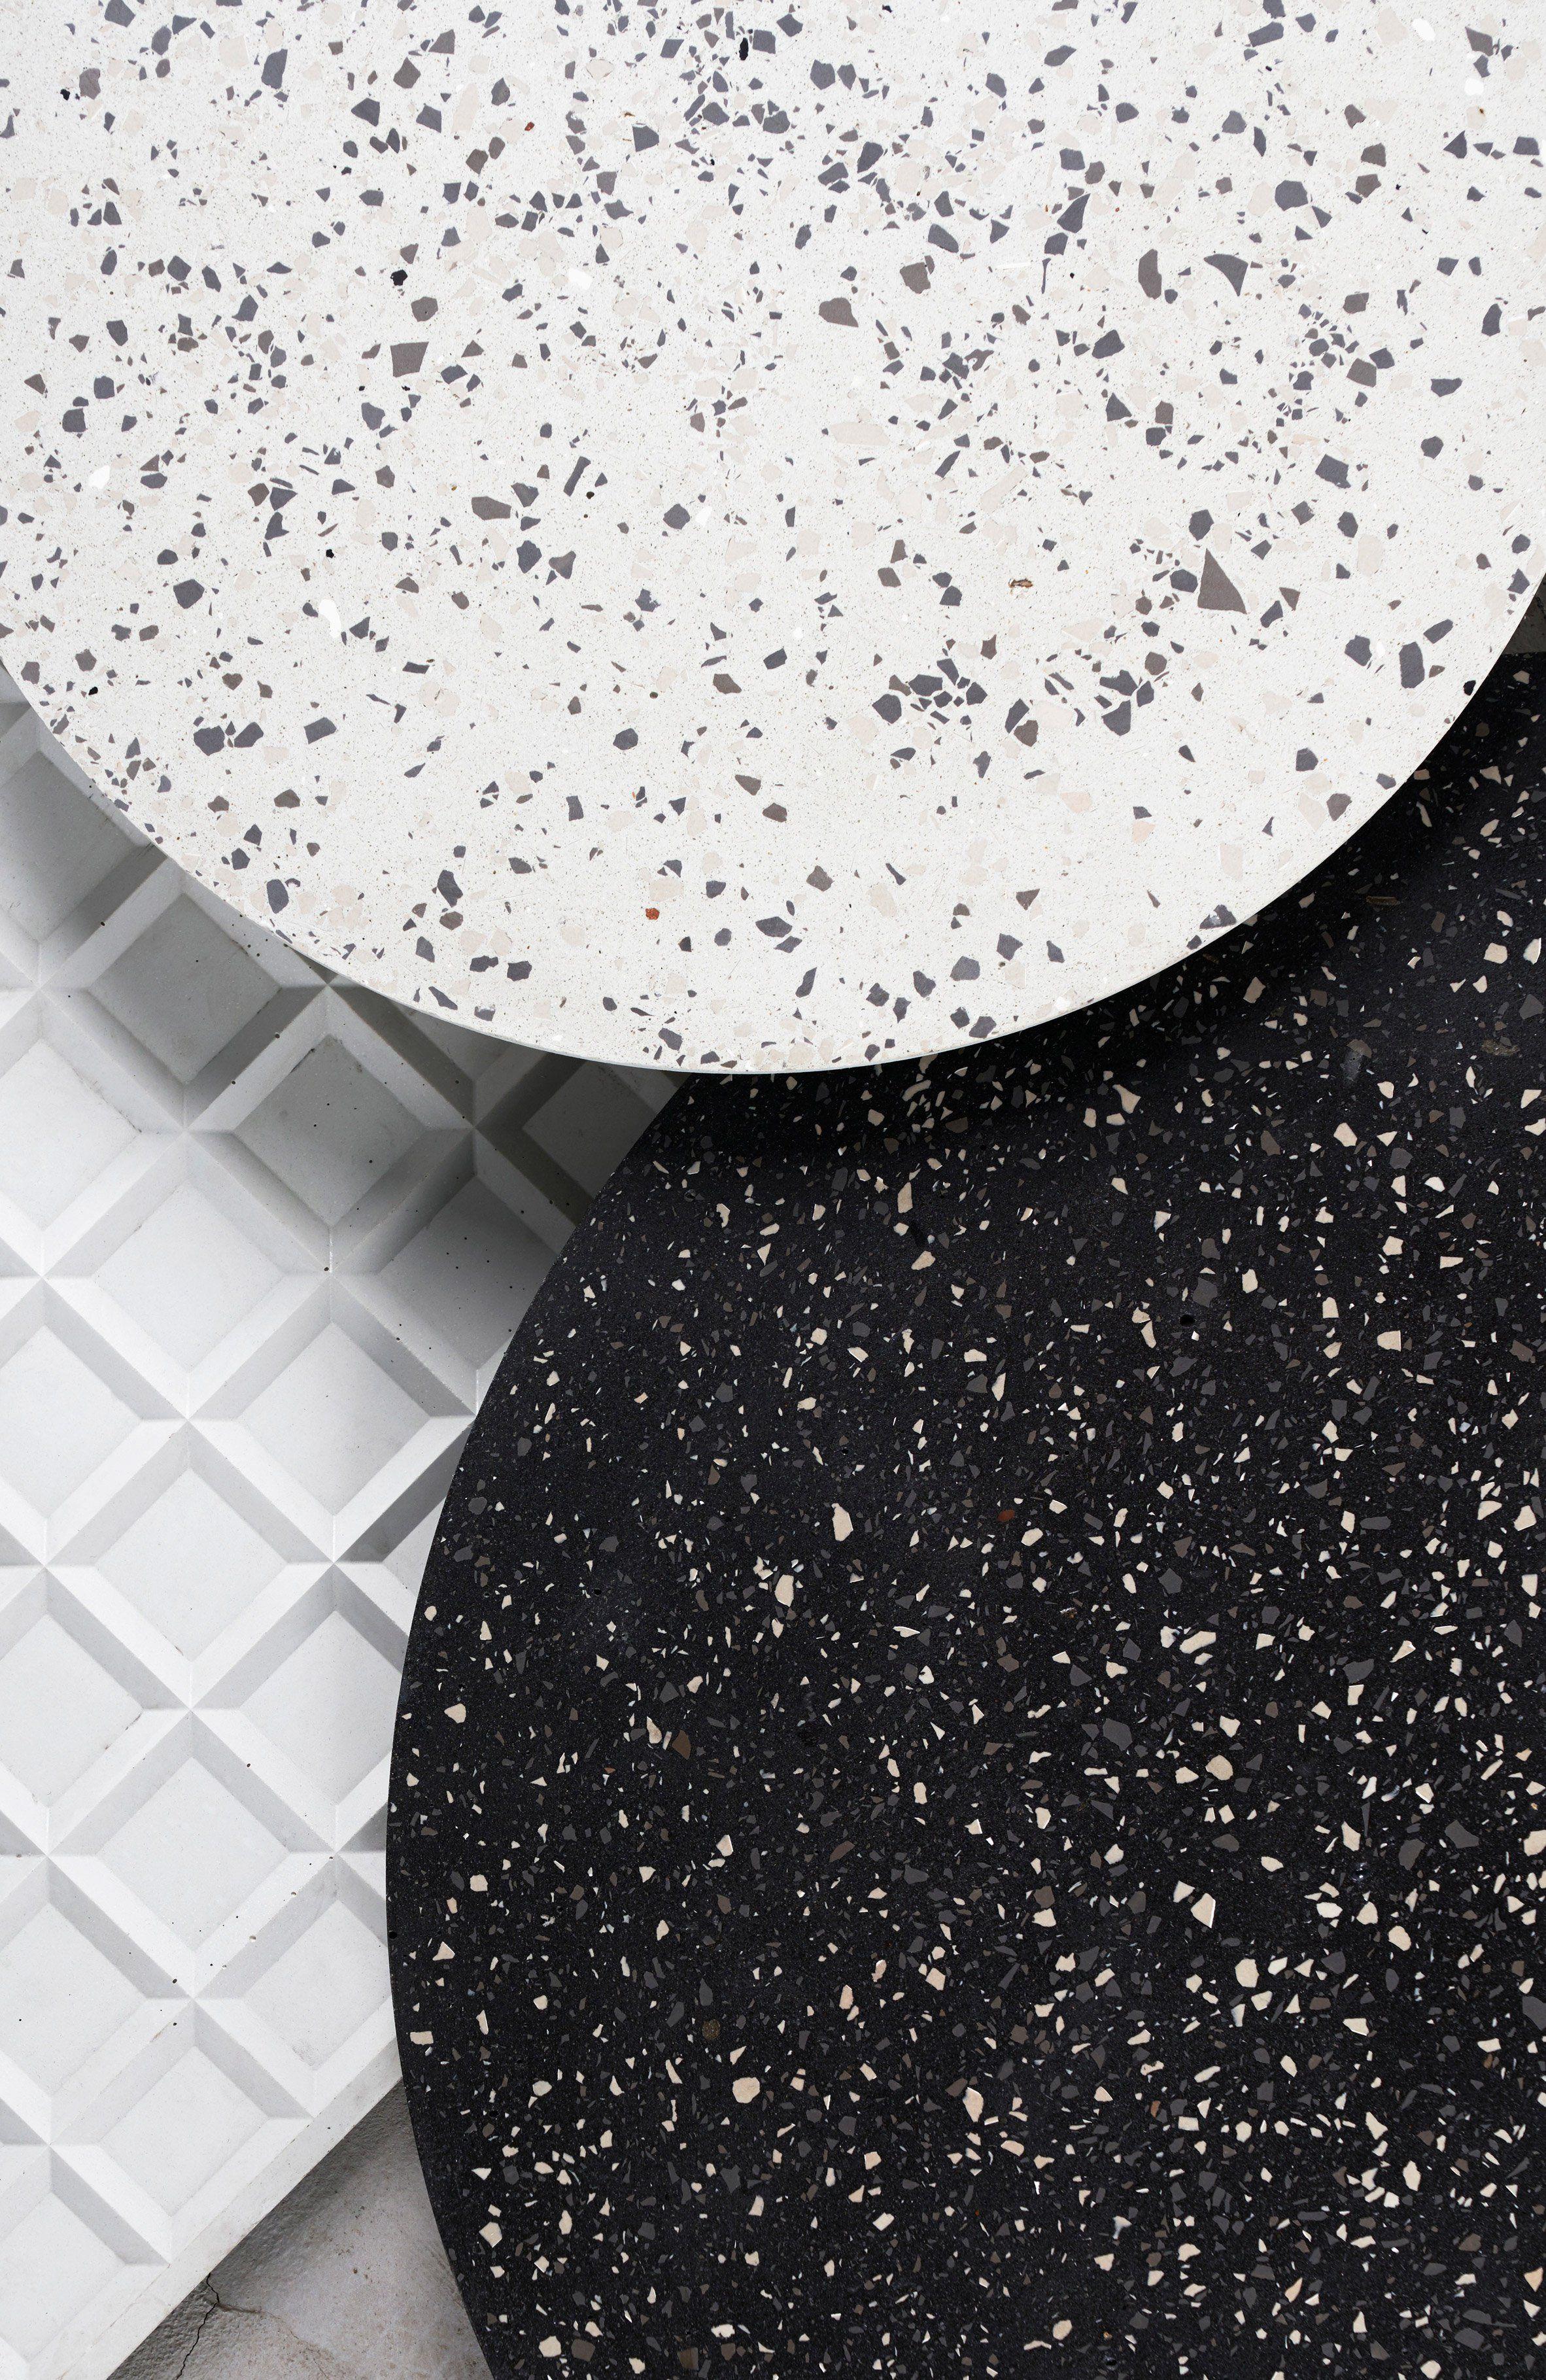 Bentu design makes terrazzo furniture using recycled ceramic waste bentu design makes terrazzo furniture using recycled ceramic waste dailygadgetfo Choice Image